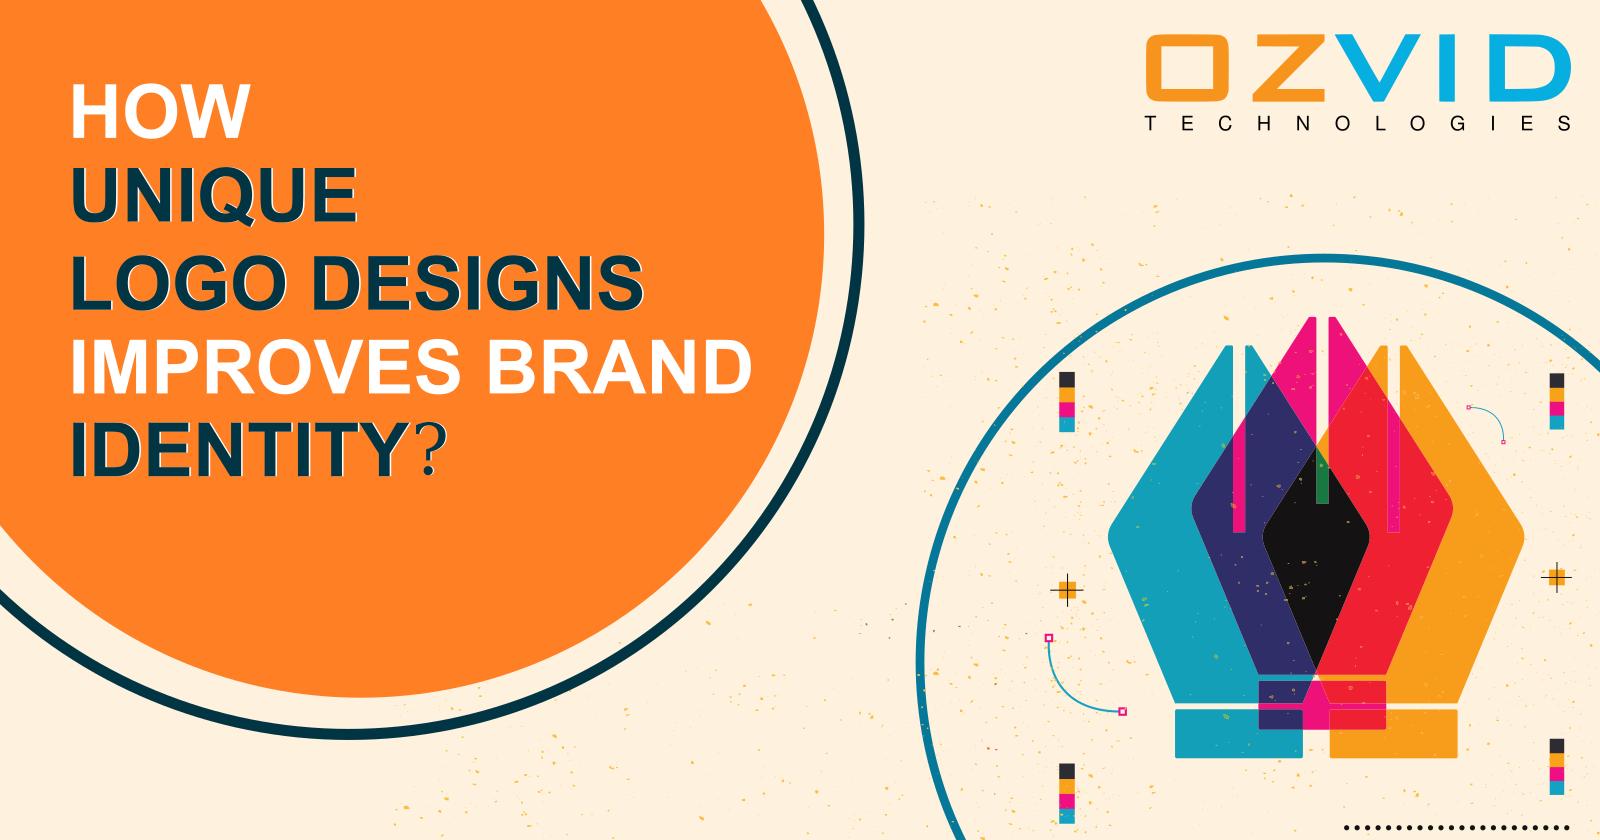 How Unique Logo Designs Improves Brand Identity?